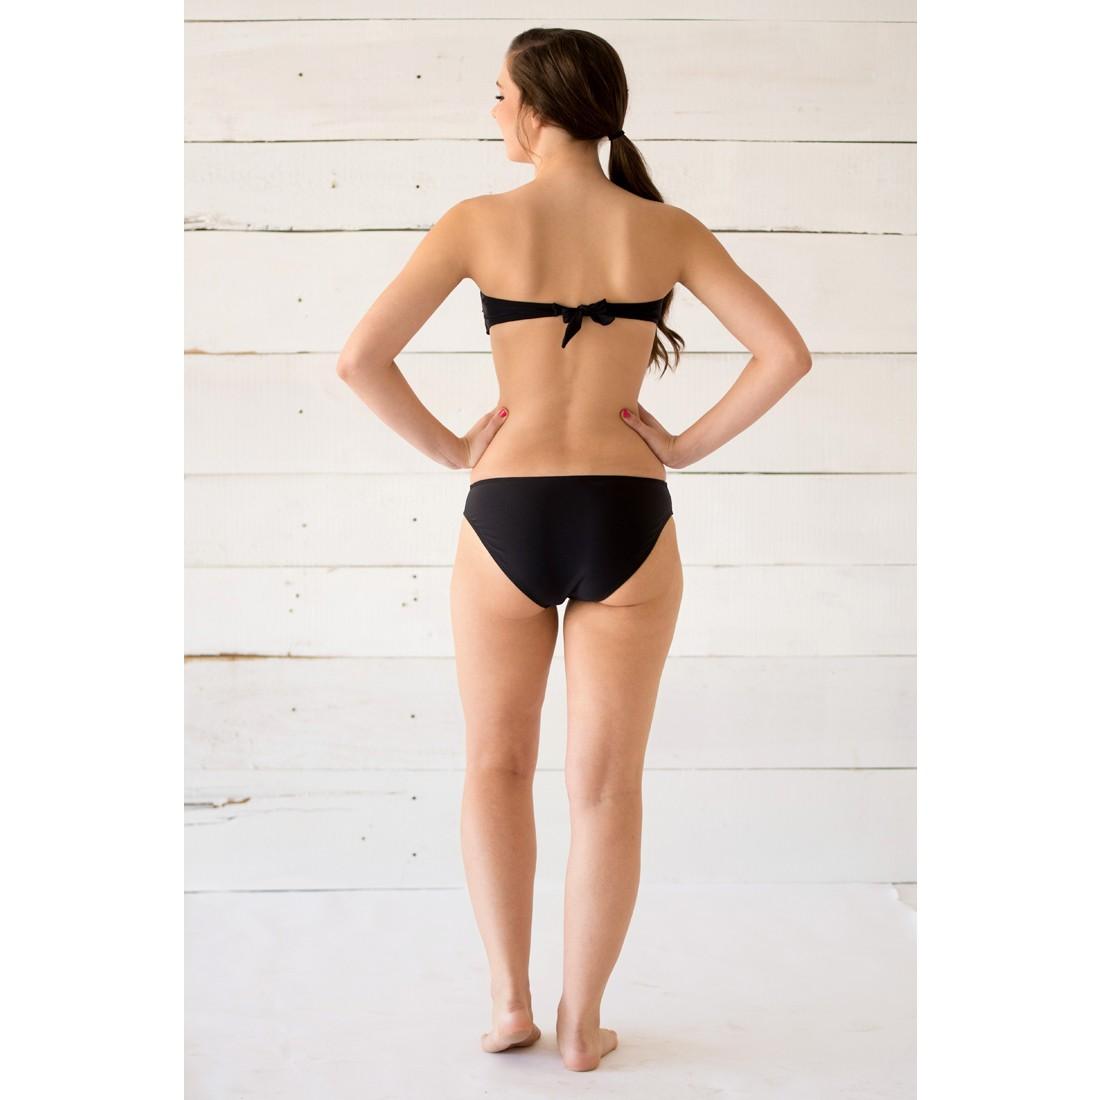 Bikini girl hot wallpaper